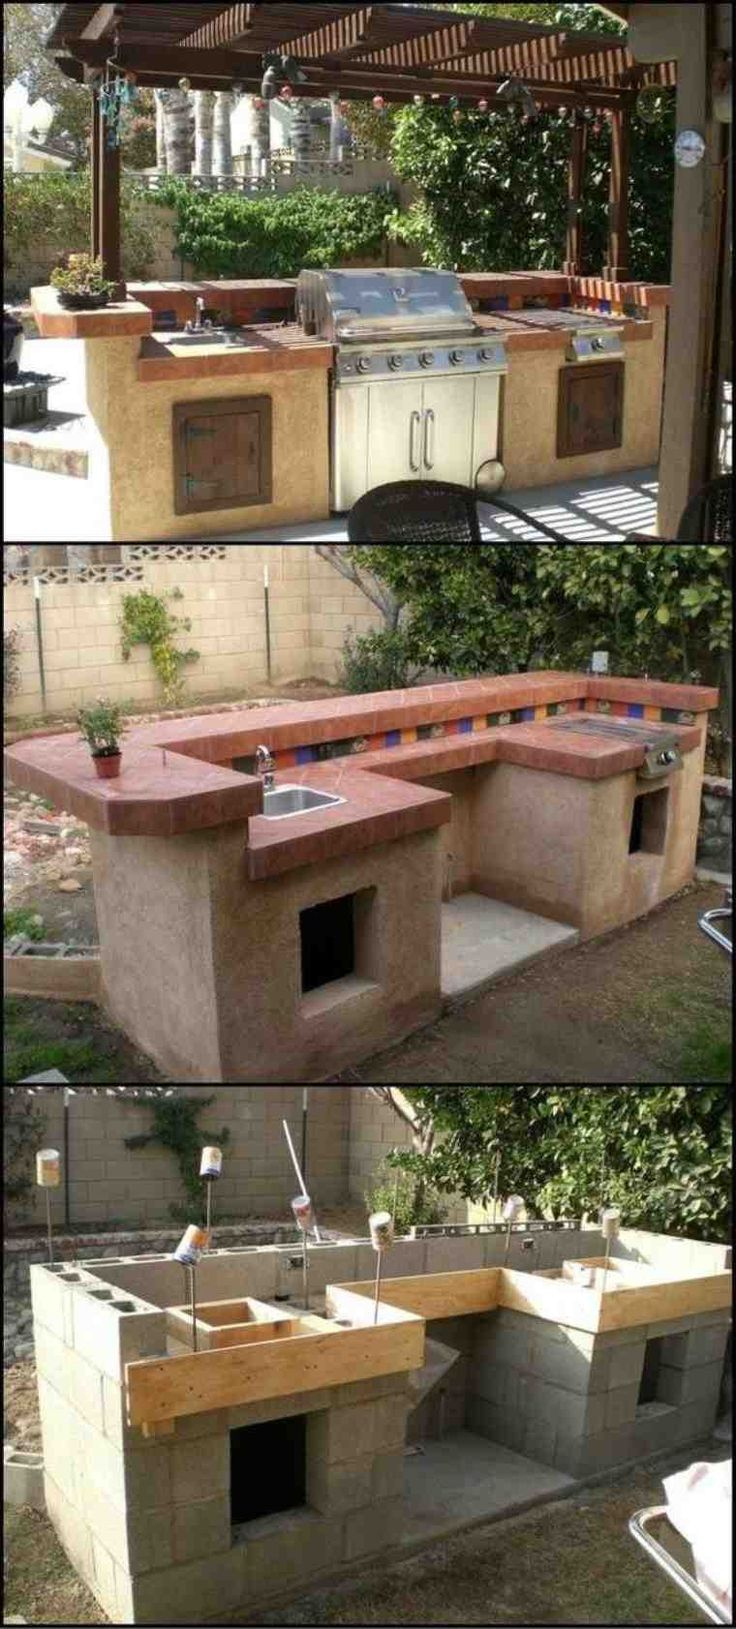 Amenagement-Meuble-Jardin-Remodelage | Bahçe Tasarımı | Dış ... tout Am2Nagement Jardin